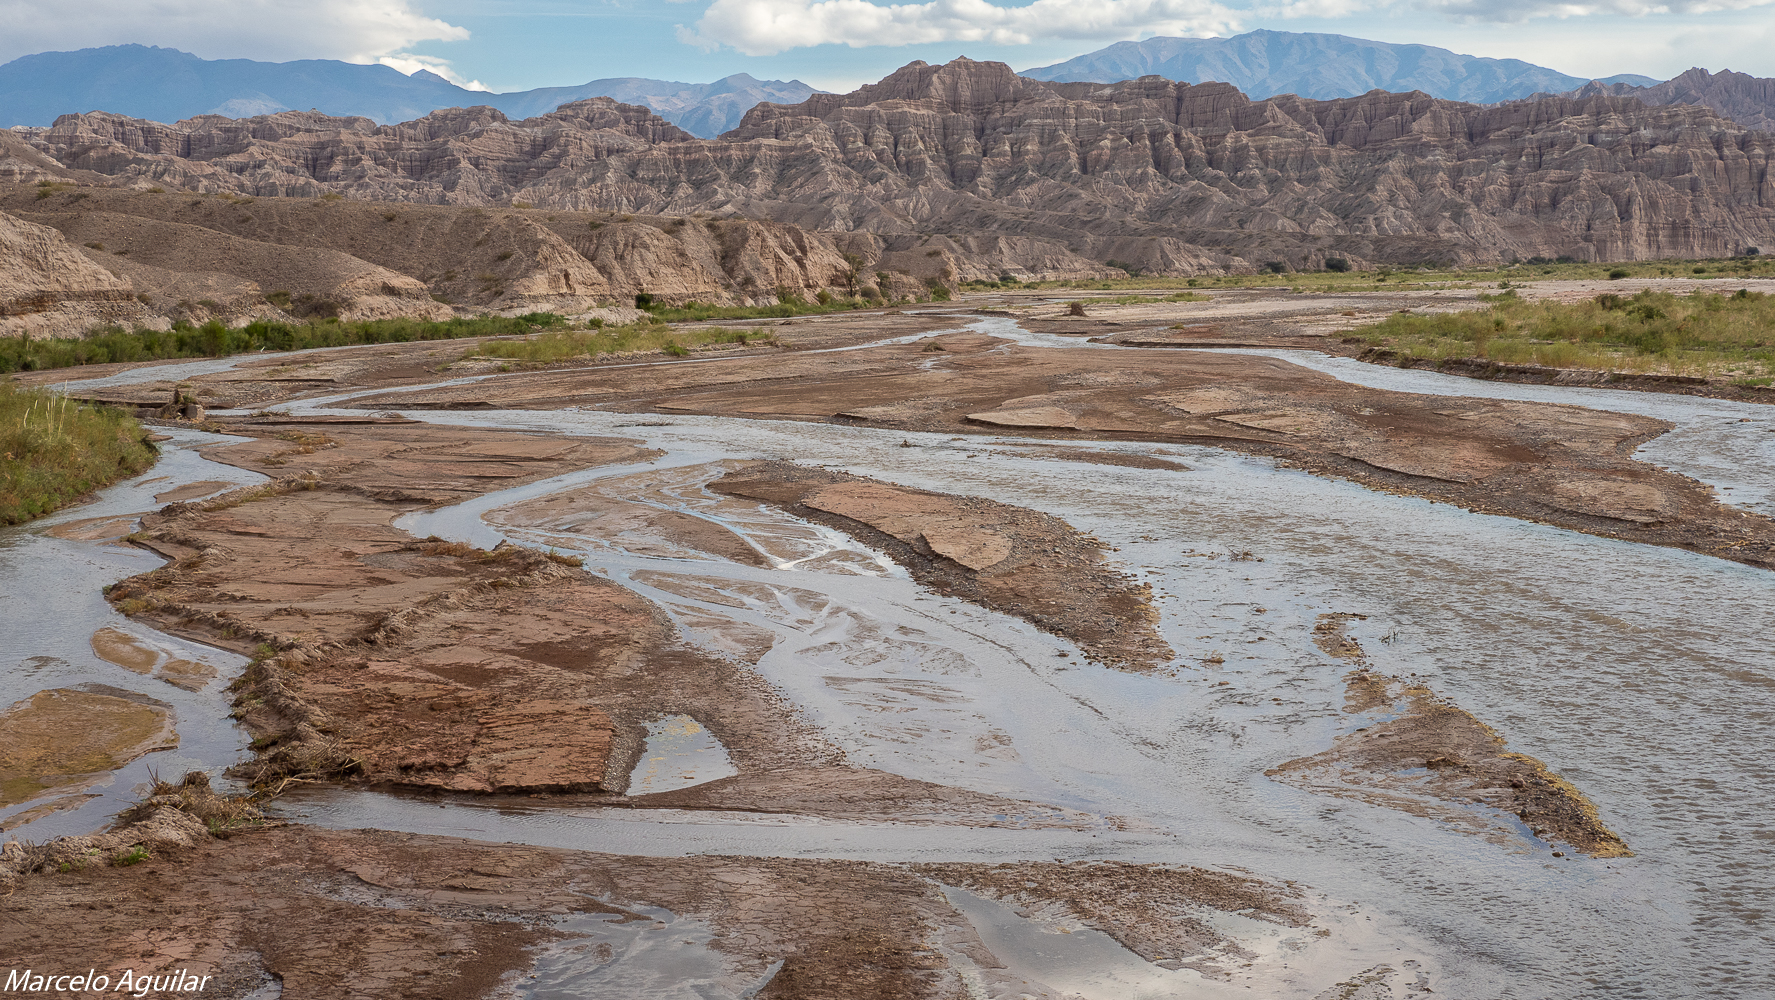 Río Calchaquí, Argentina